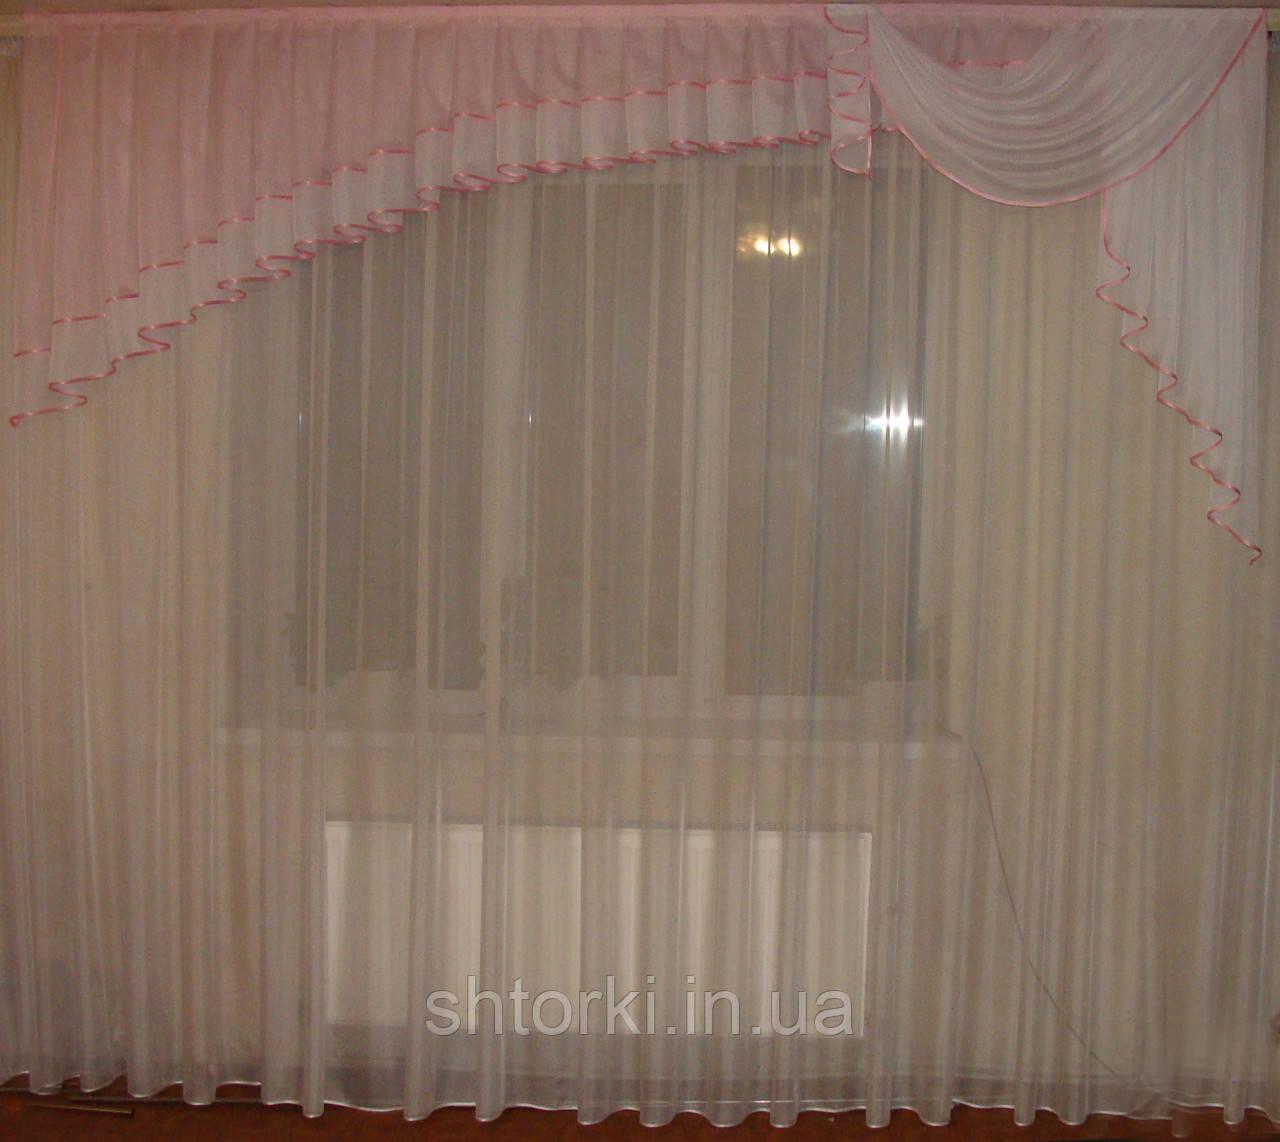 Ламбрикен Ассиметрия 3м нежно розовый Шифон